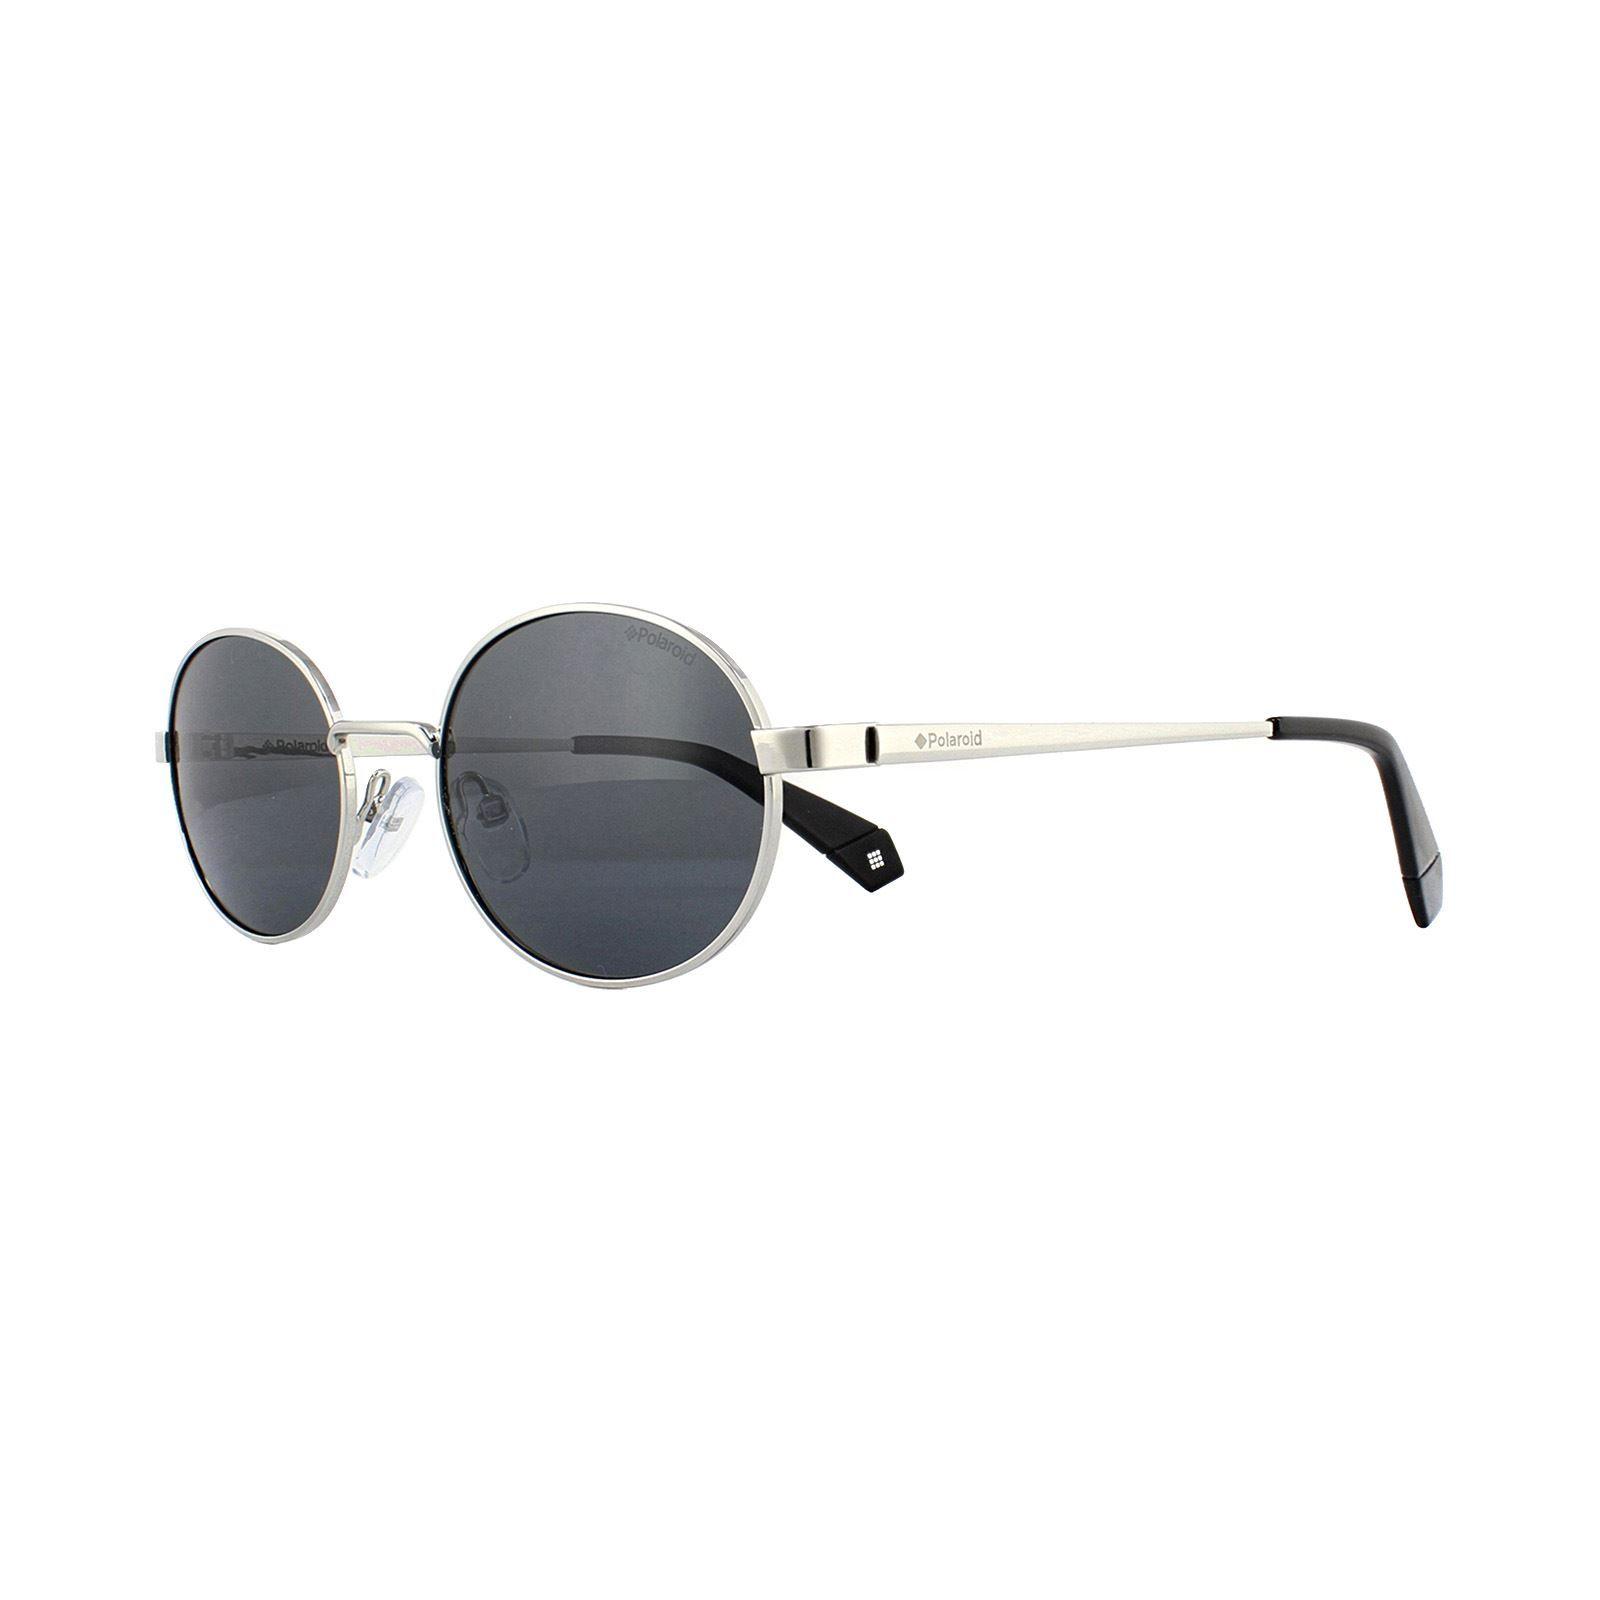 Polaroid Sunglasses PLD 6066/S 79D M9 Silver Black Grey Polarized